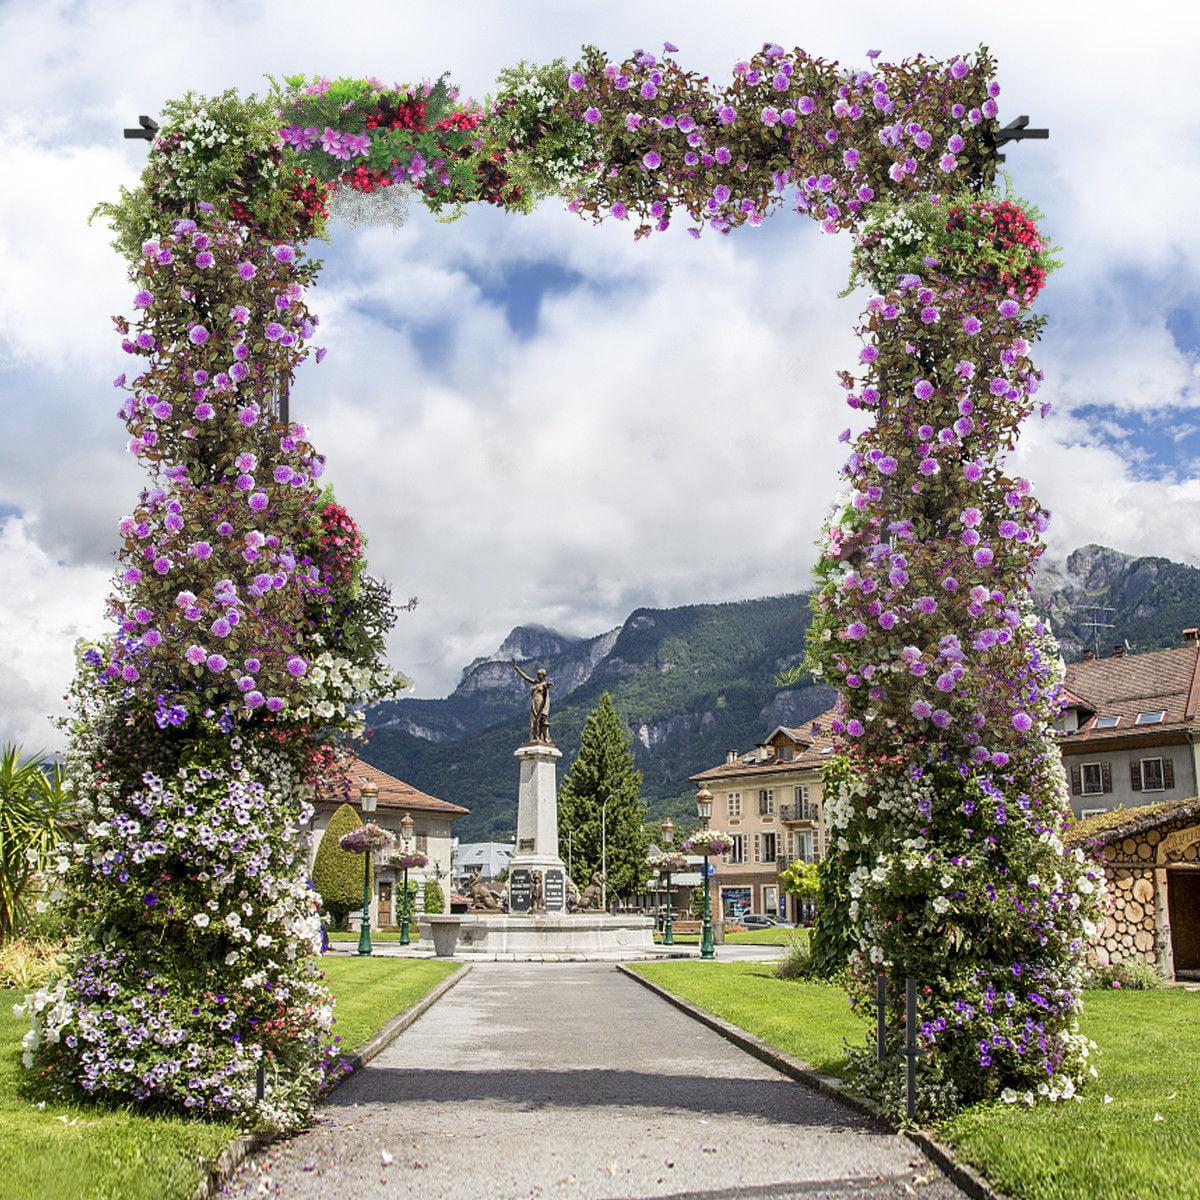 Wedding Arbor Flowers: Costway Garden Wedding Rose Arch Pergola Archway Flowers